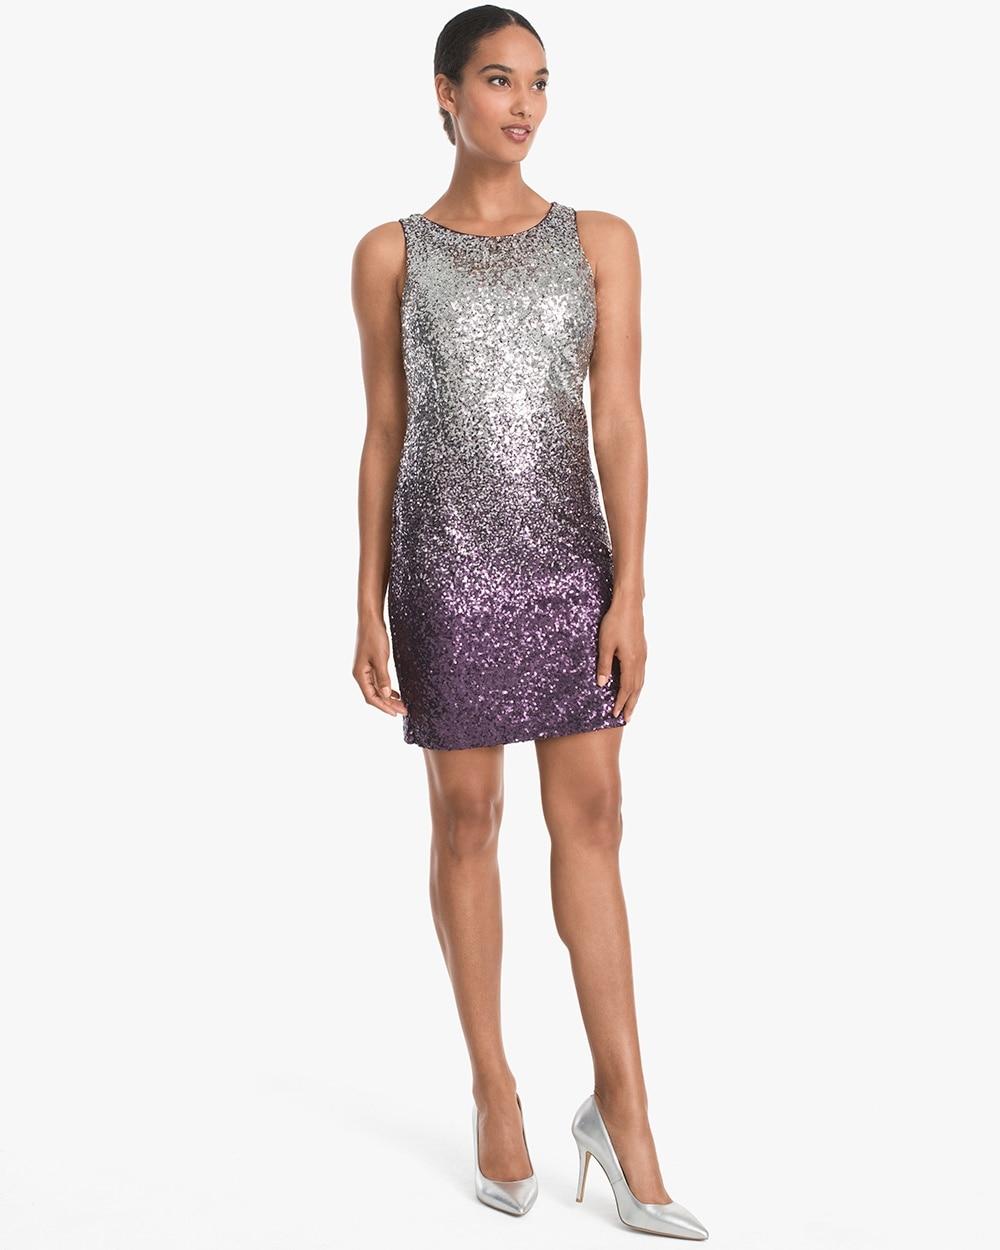 Ombre Sequin Shift Dress White House Black Market